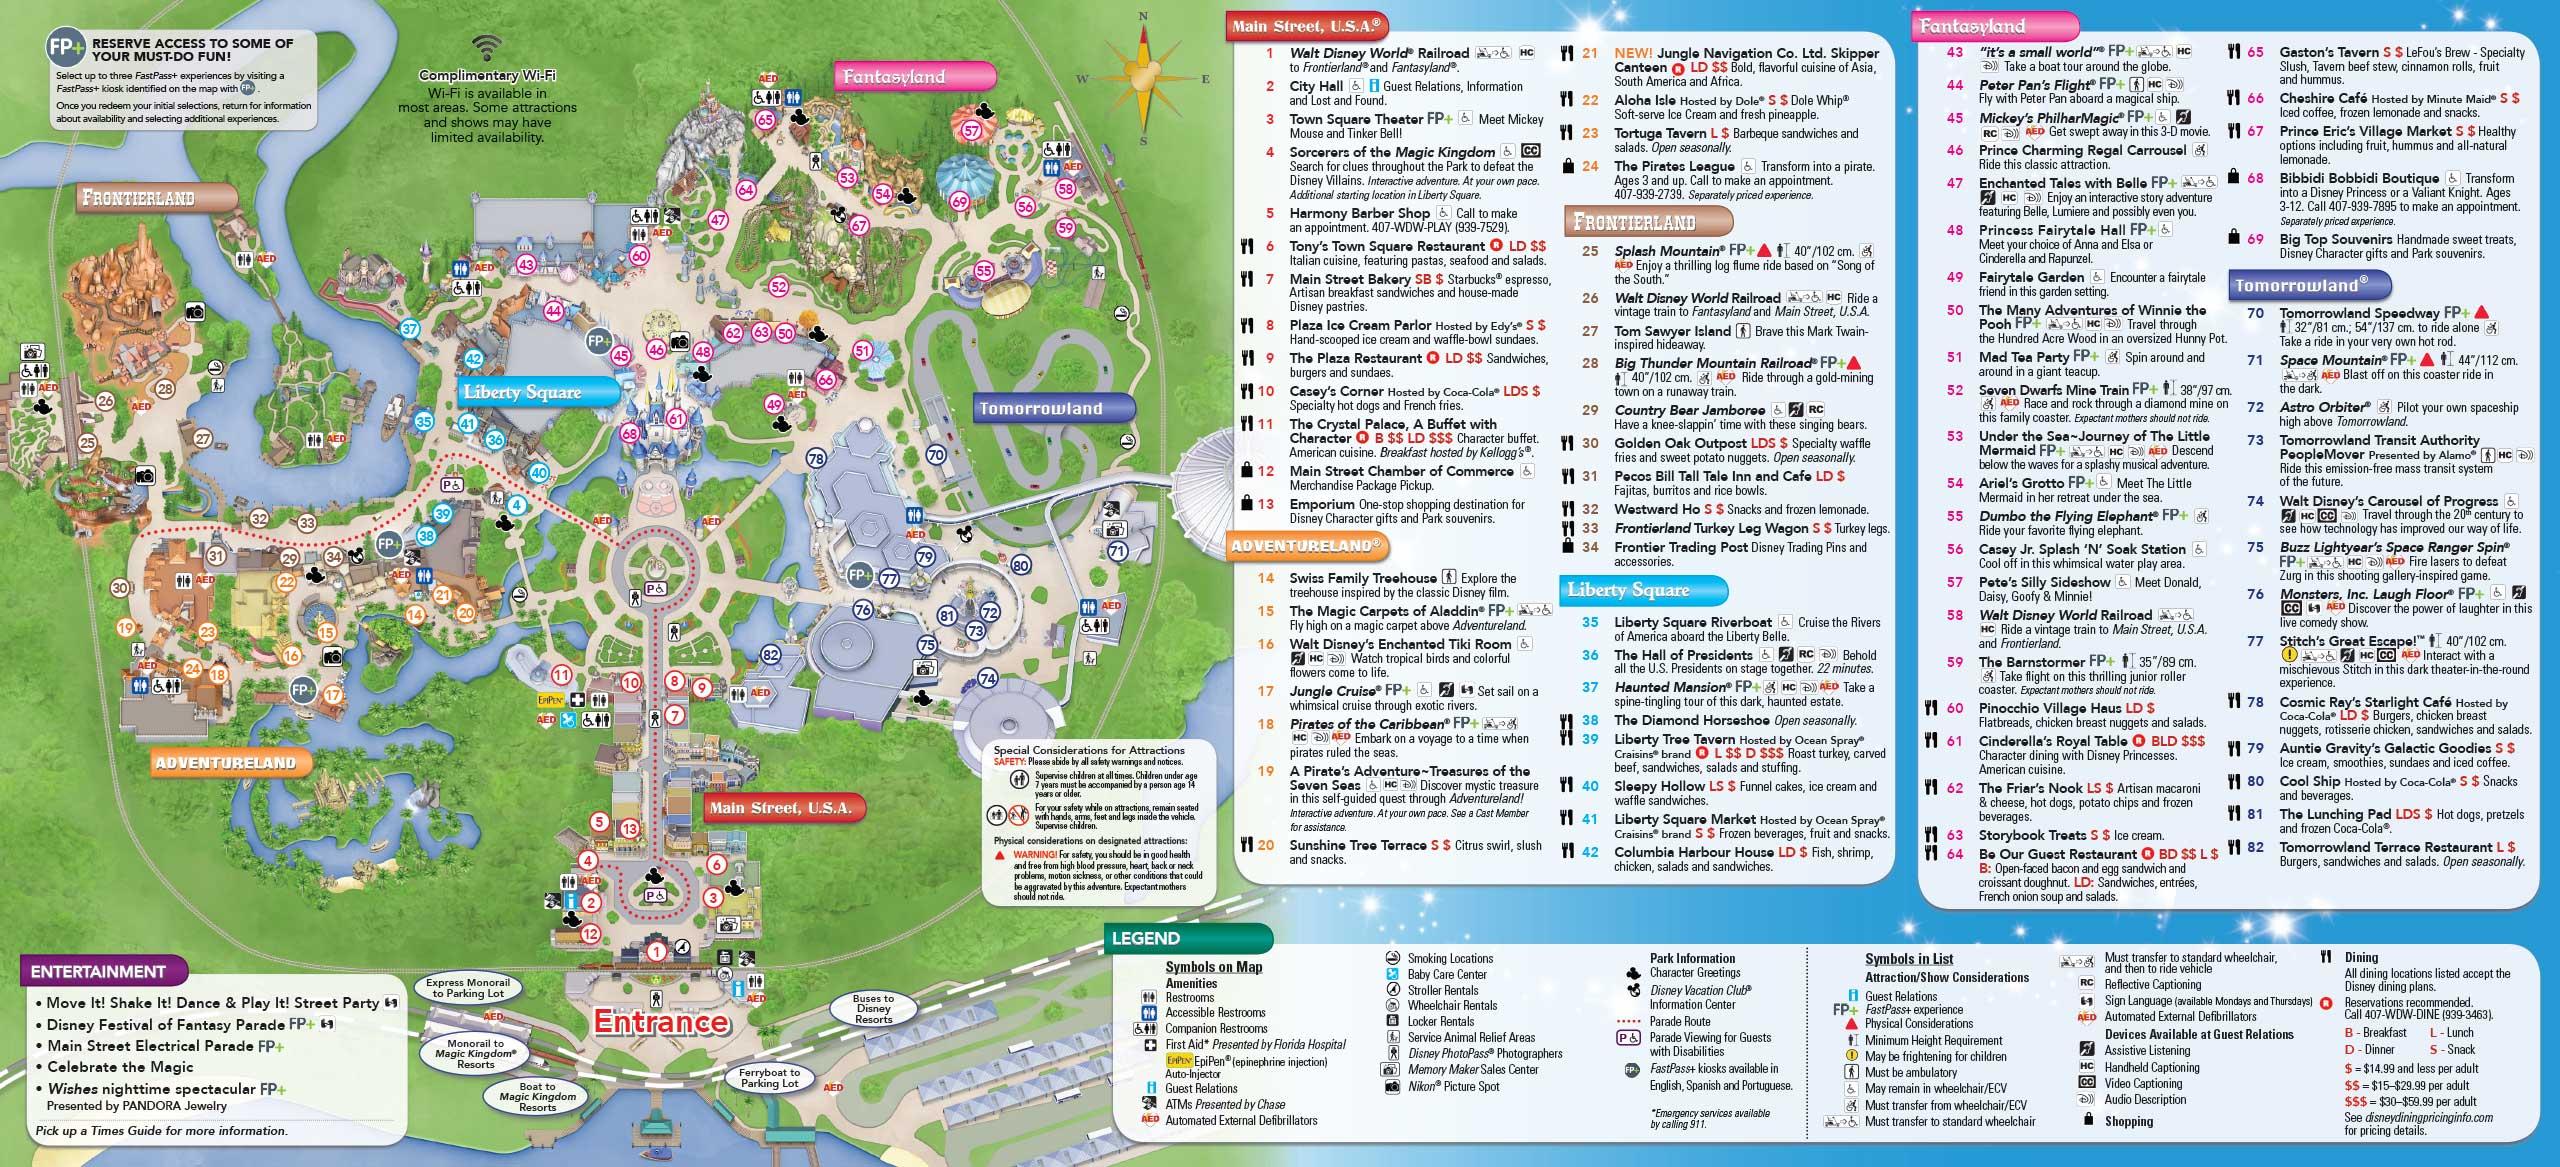 January 2016 walt disney world park maps photo 8 of 12 january 2016 walt disney world park maps freerunsca Gallery